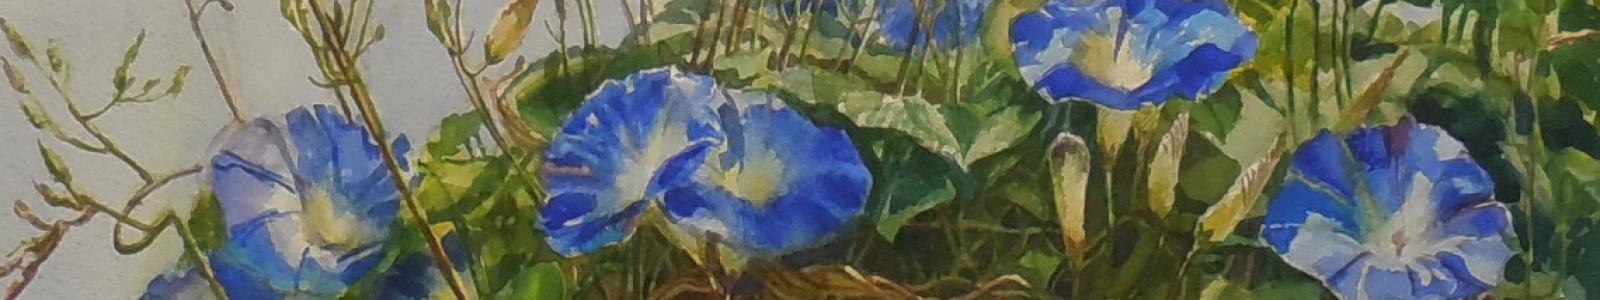 Gallery Painter Swetlana Yegorova